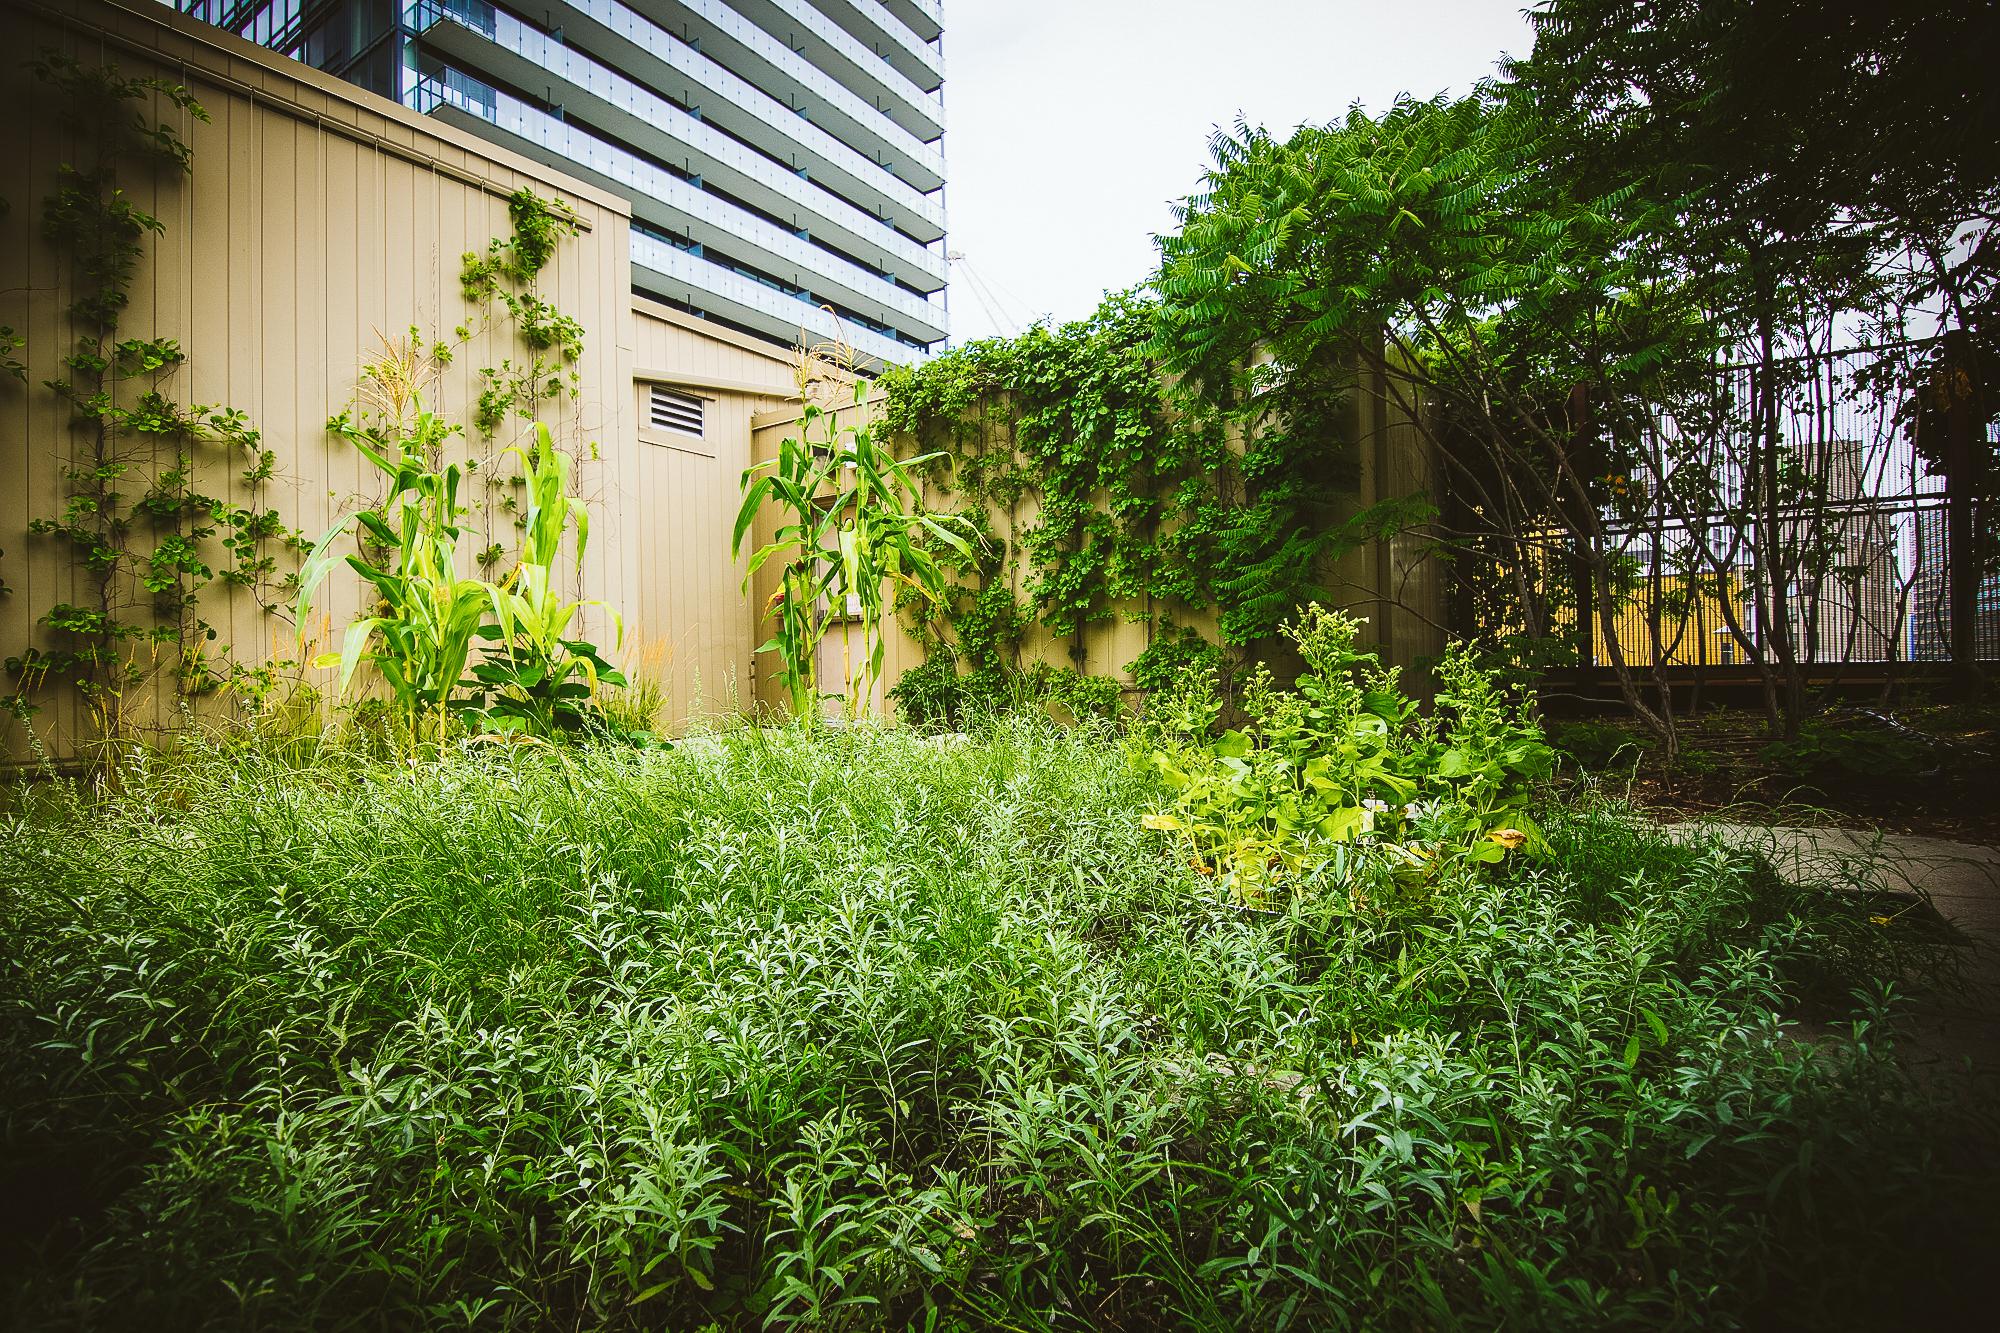 gardens-0656.jpg